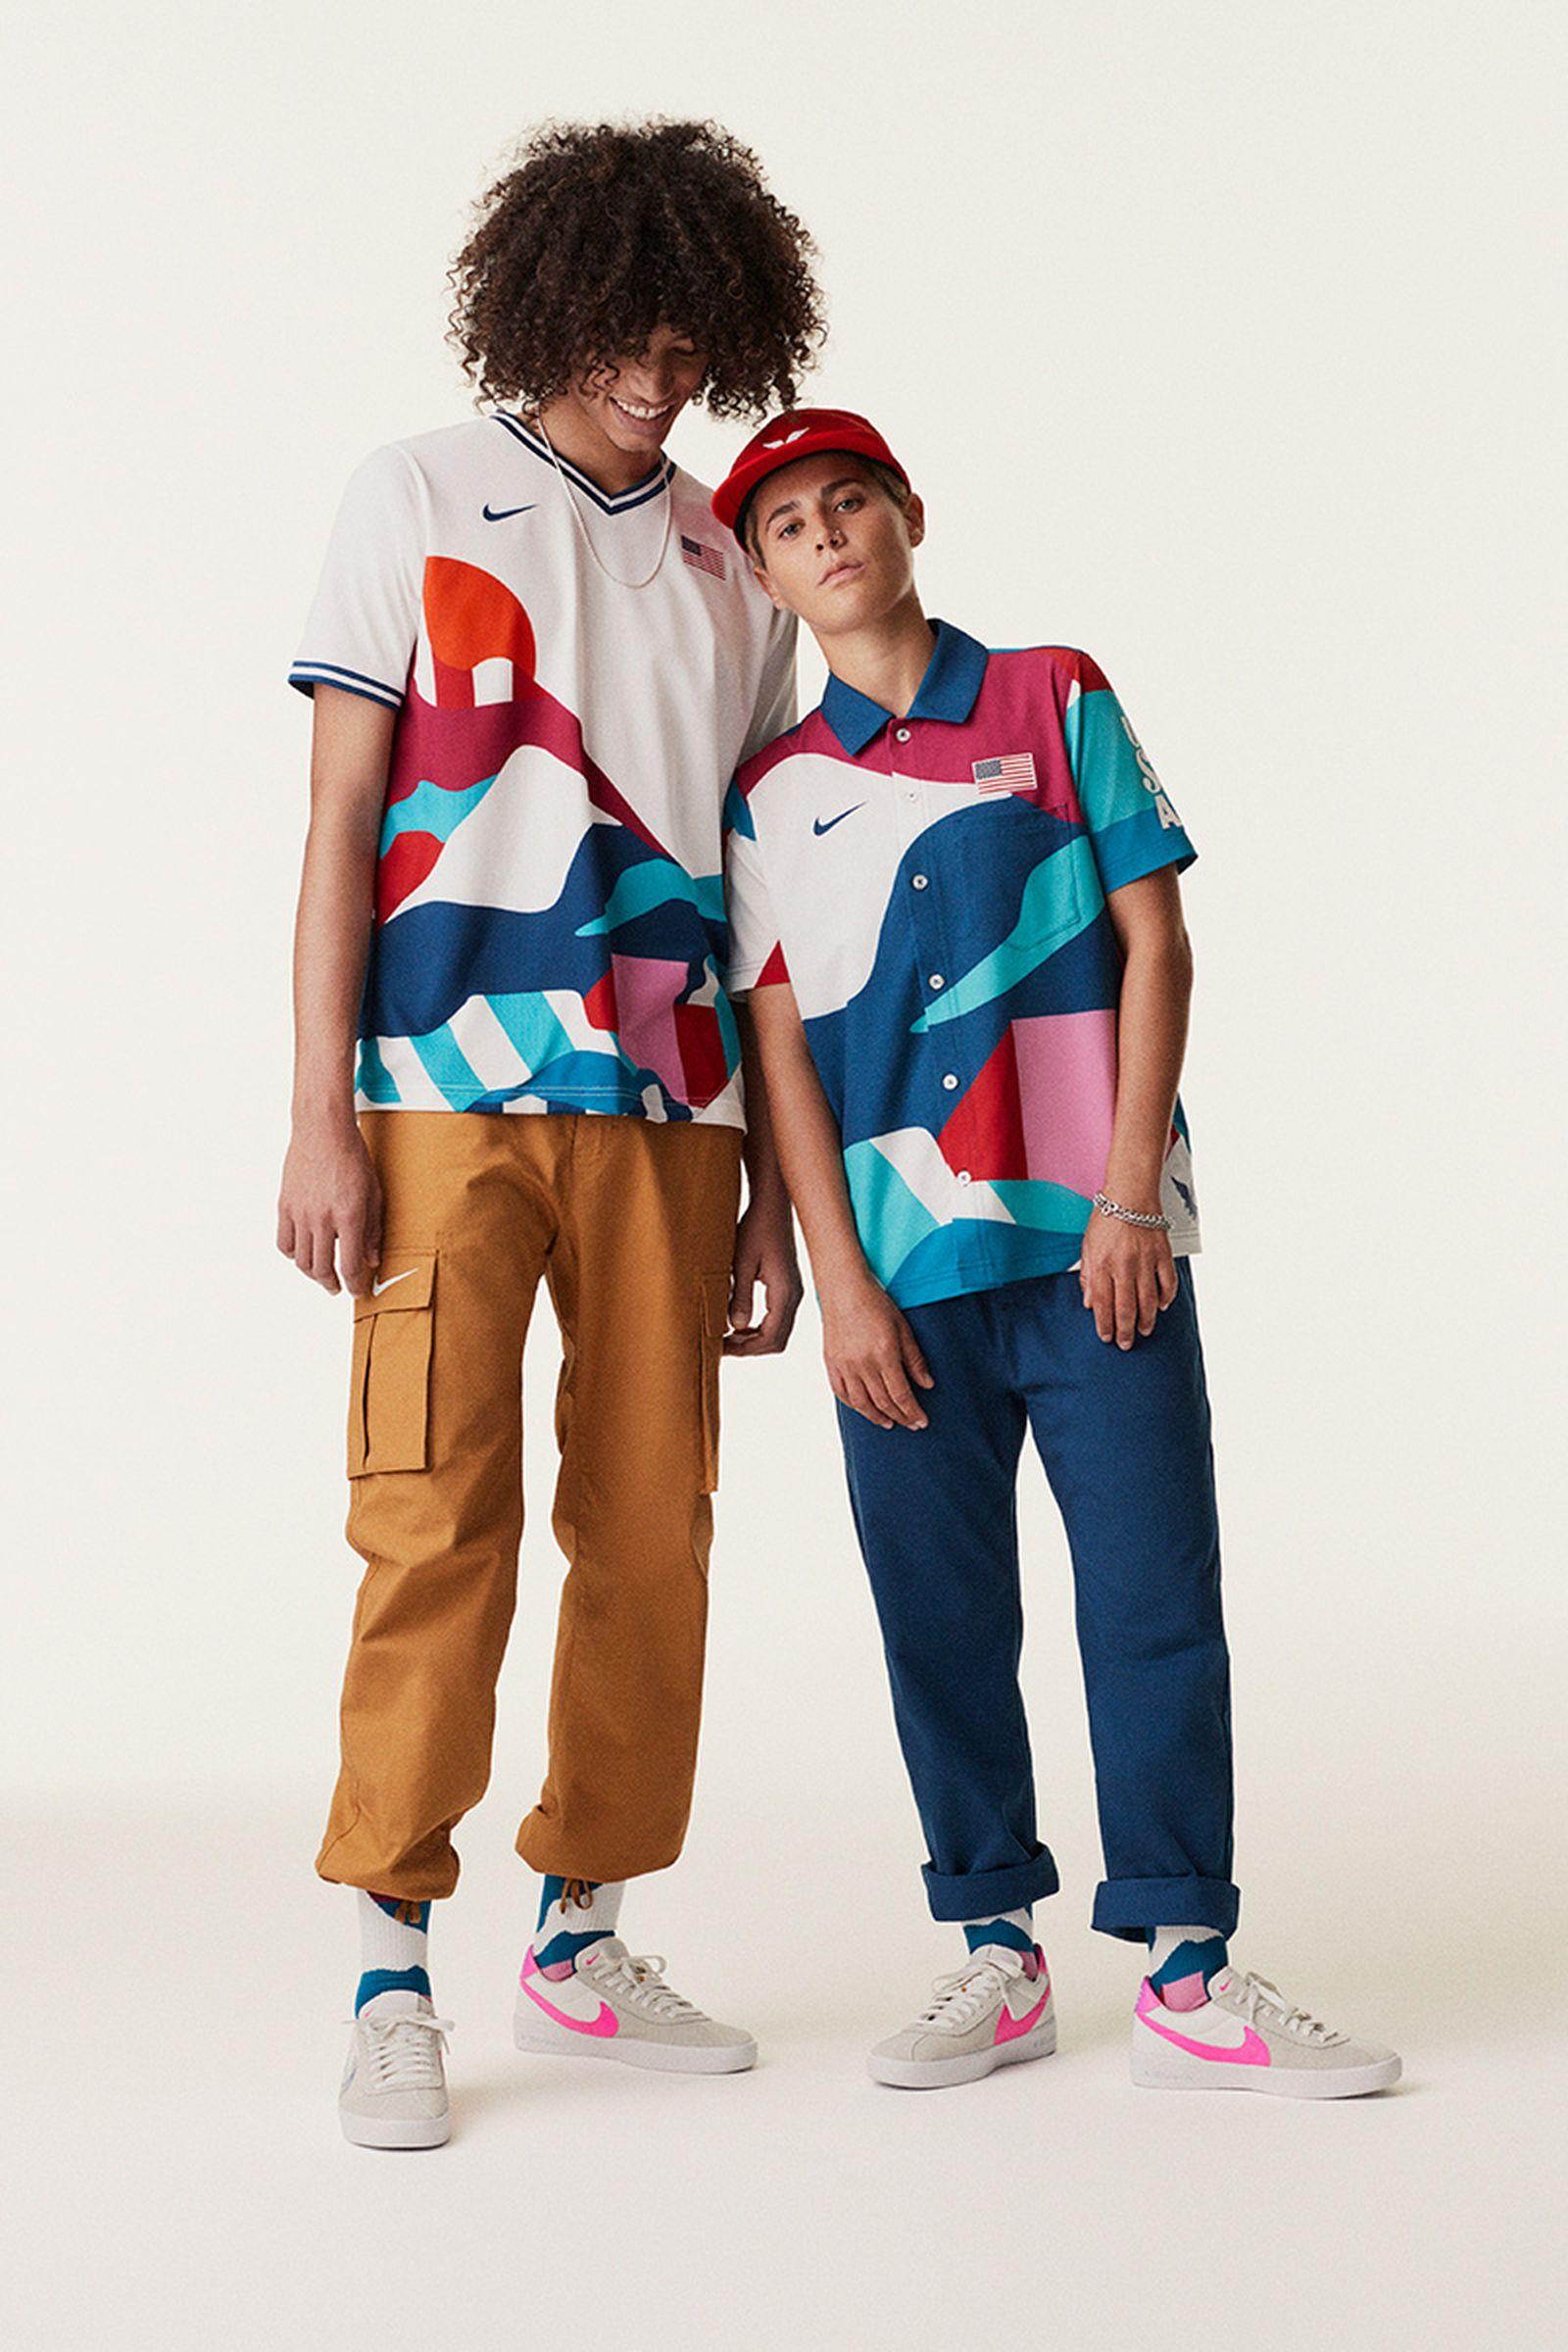 nike-sb-tokyo-olympics-skateboarding-uniforms-04